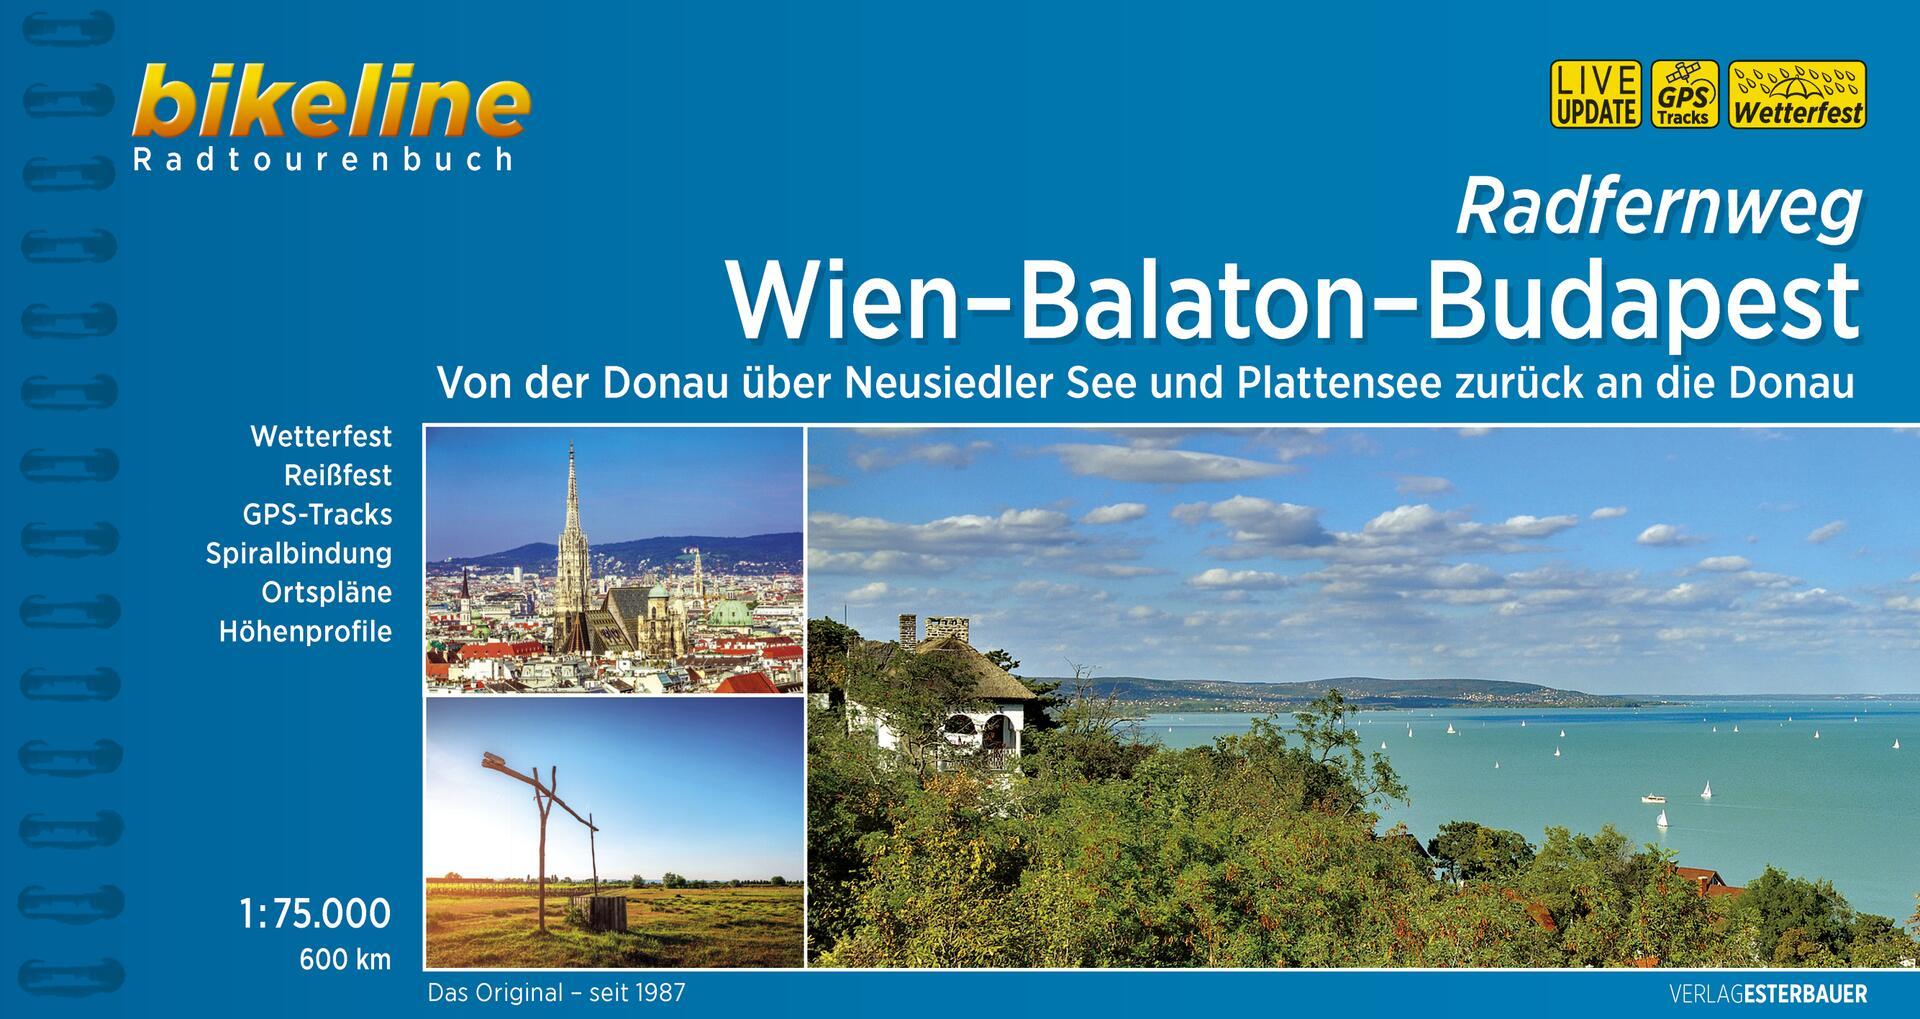 Foto vom Radfernweg Wien-Balaton-Budapest